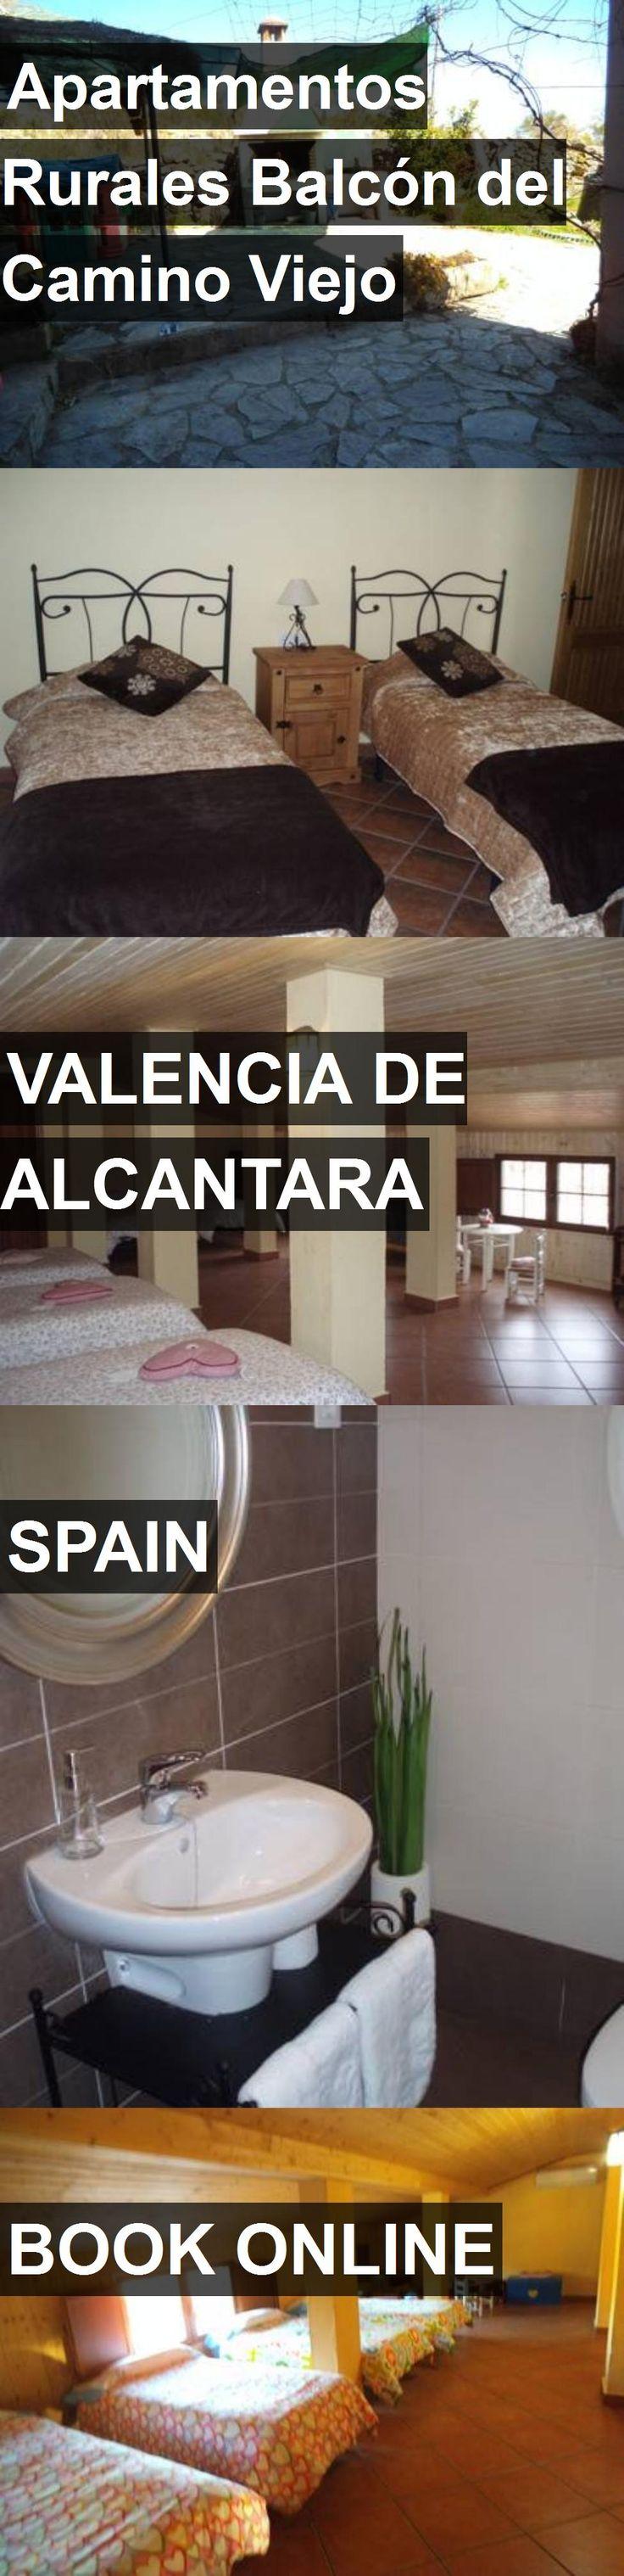 Hotel Apartamentos Rurales Balcón del Camino Viejo in Valencia de Alcantara, Spain. For more information, photos, reviews and best prices please follow the link. #Spain #ValenciadeAlcantara #travel #vacation #hotel